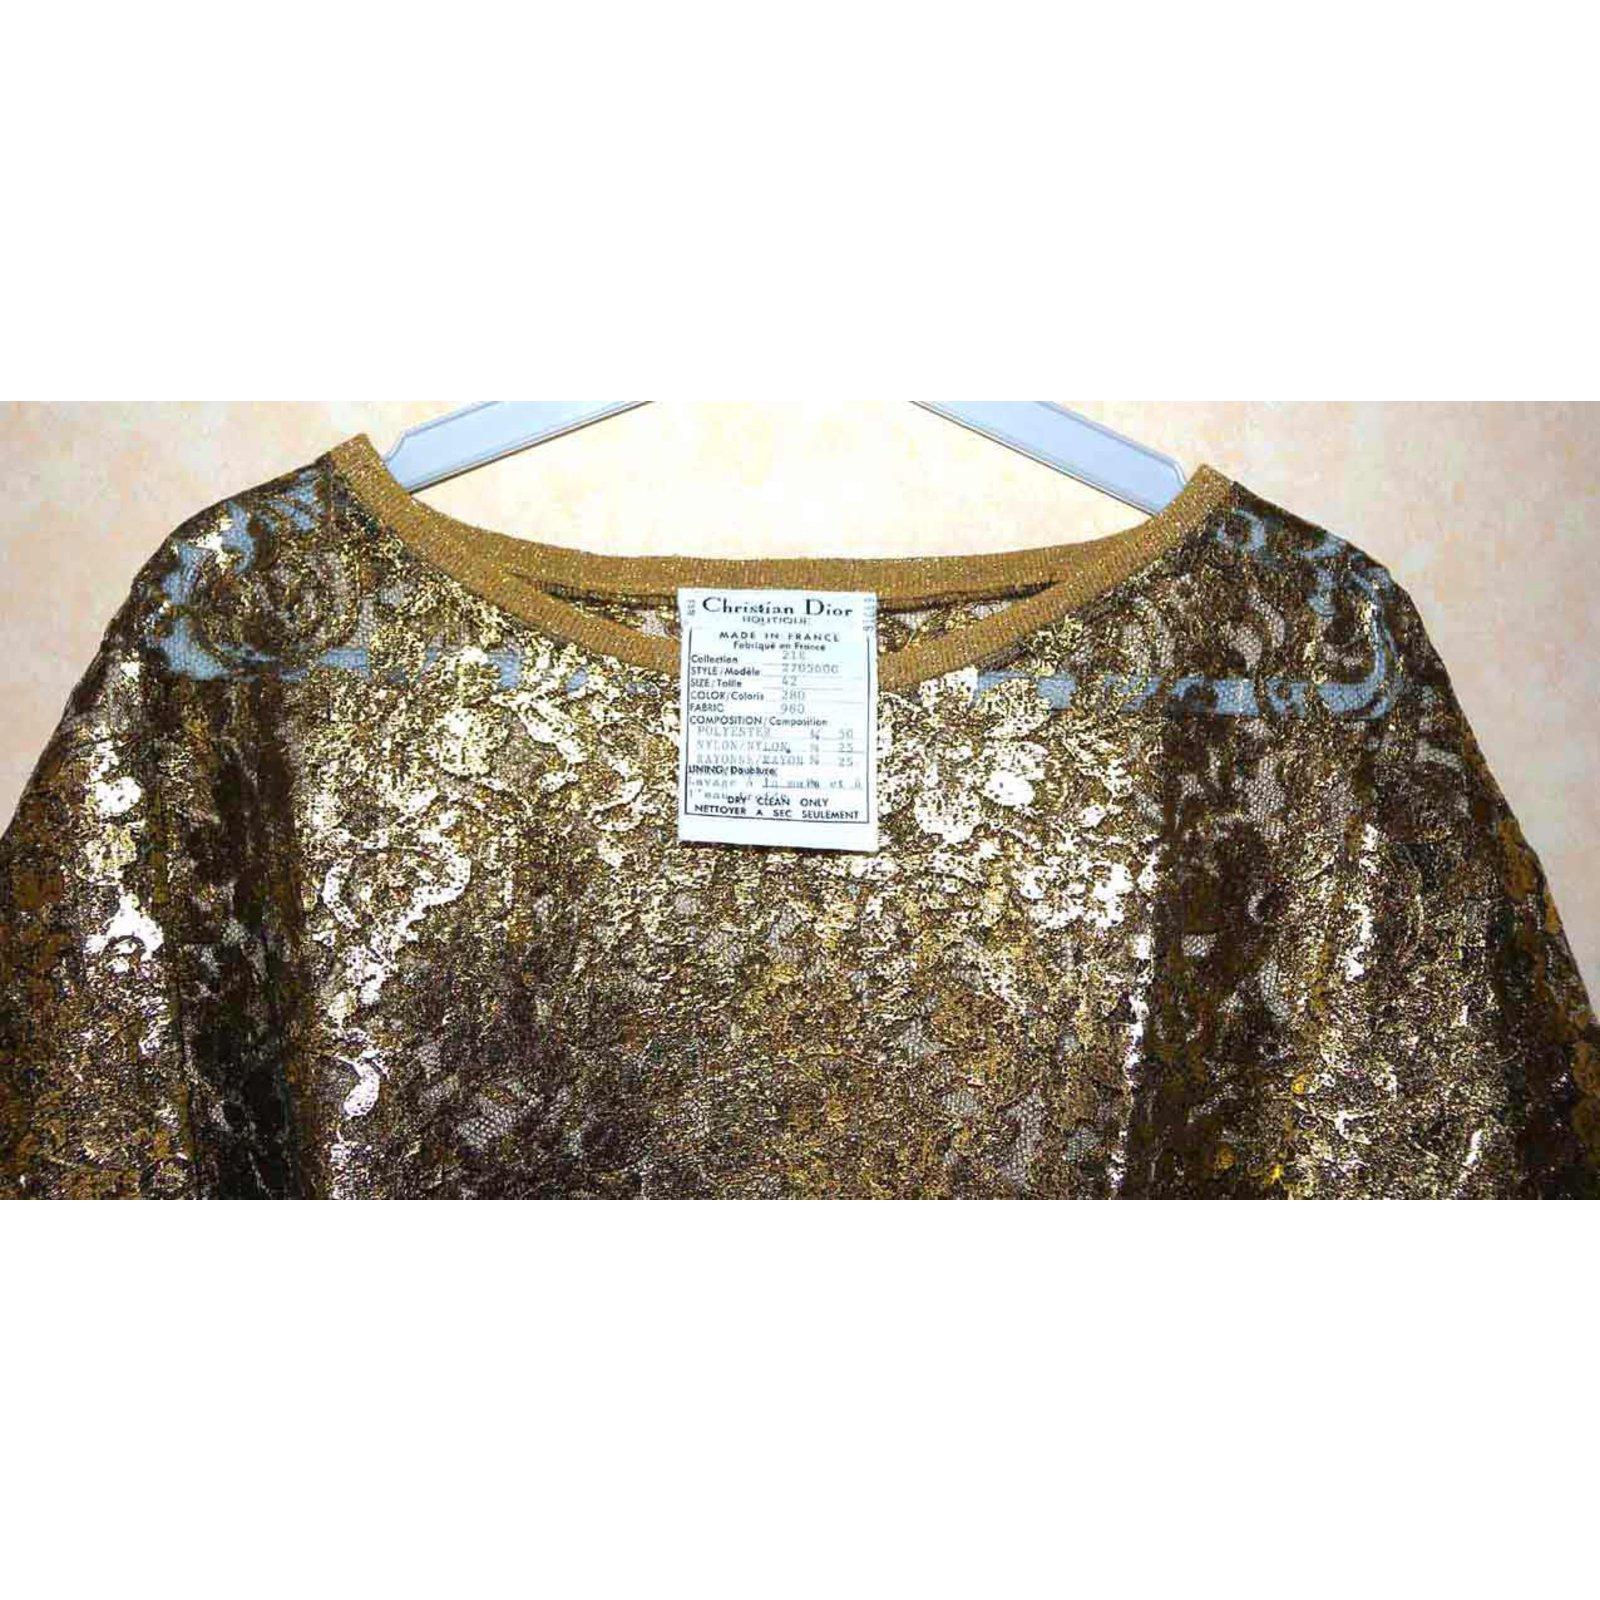 869ed668c81 Christian Dior tunic tunics Polyester,Nylon,Rayon Golden ref.37480 - Joli  Closet